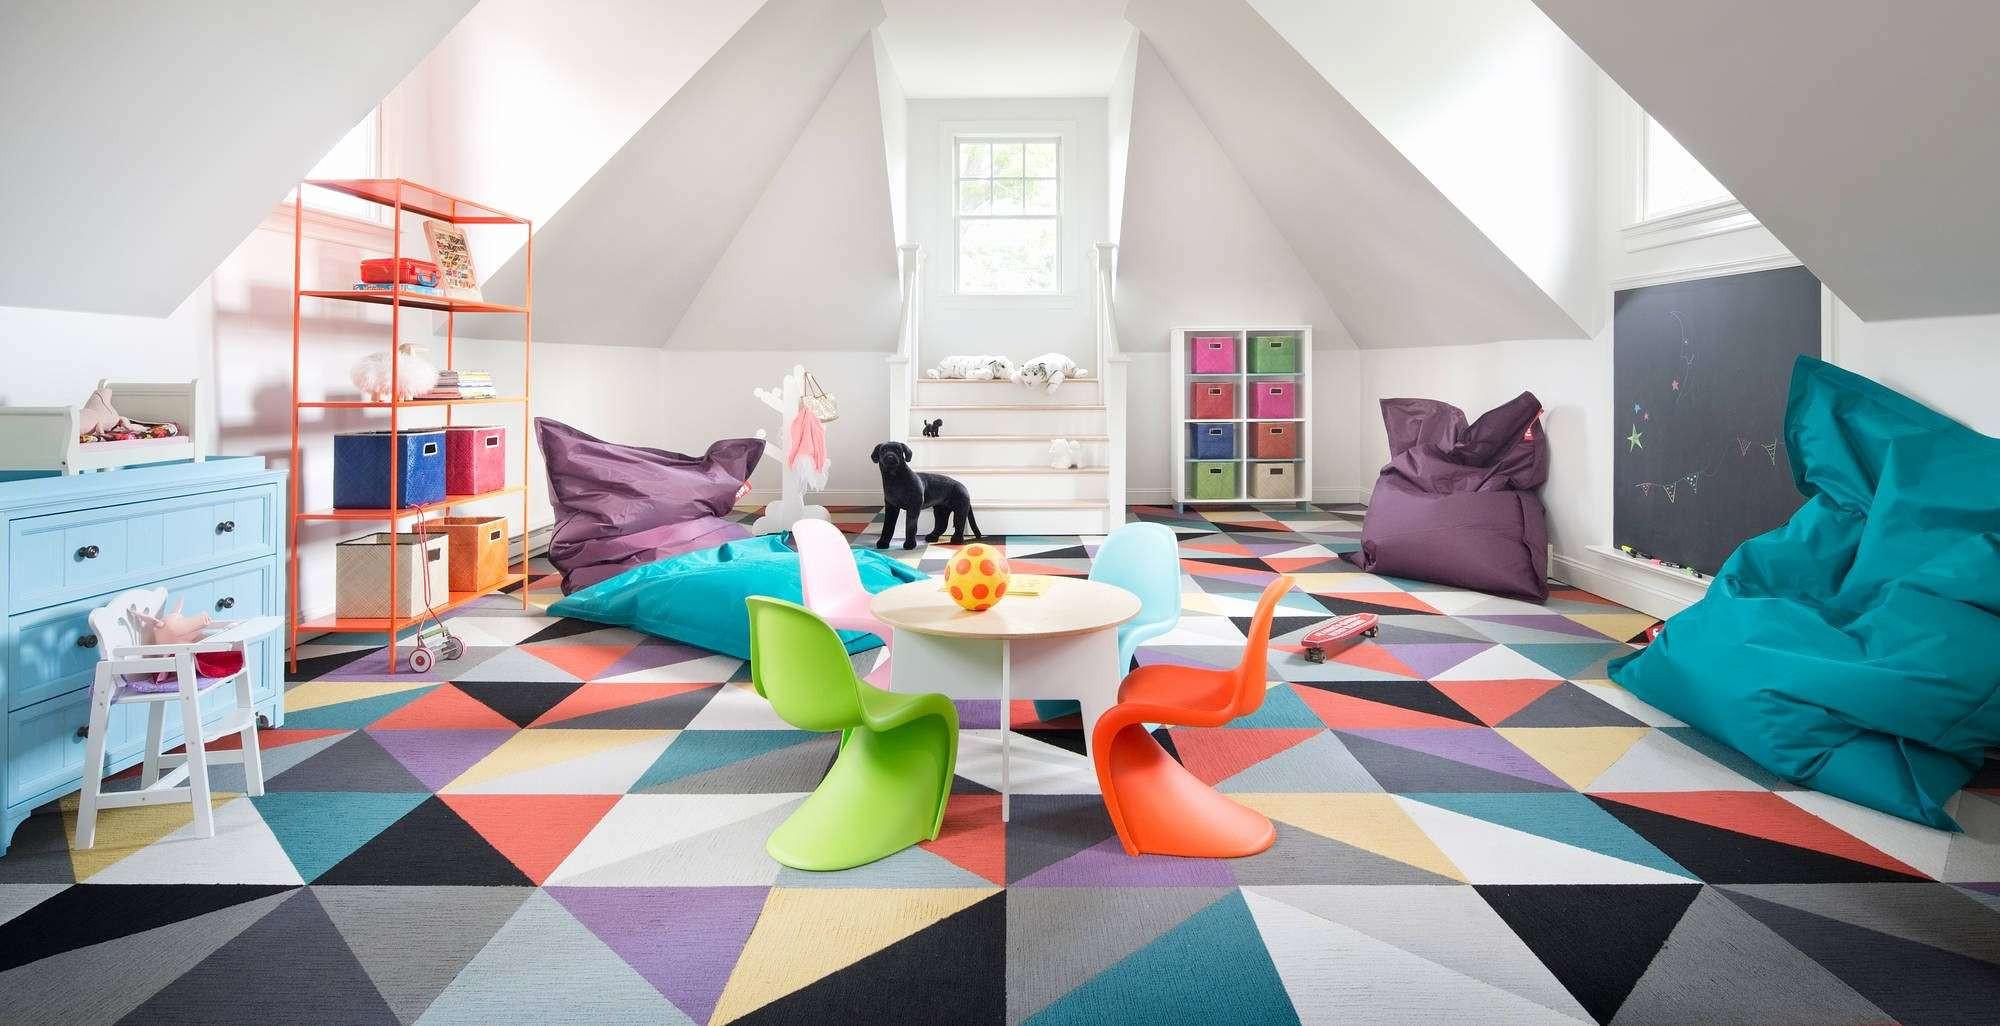 rug on hardwood floor pictures of lovely carpets for bedrooms sundulqq me for new decorating an open floor plan living room awesome design plan 0d design bedroom carpet